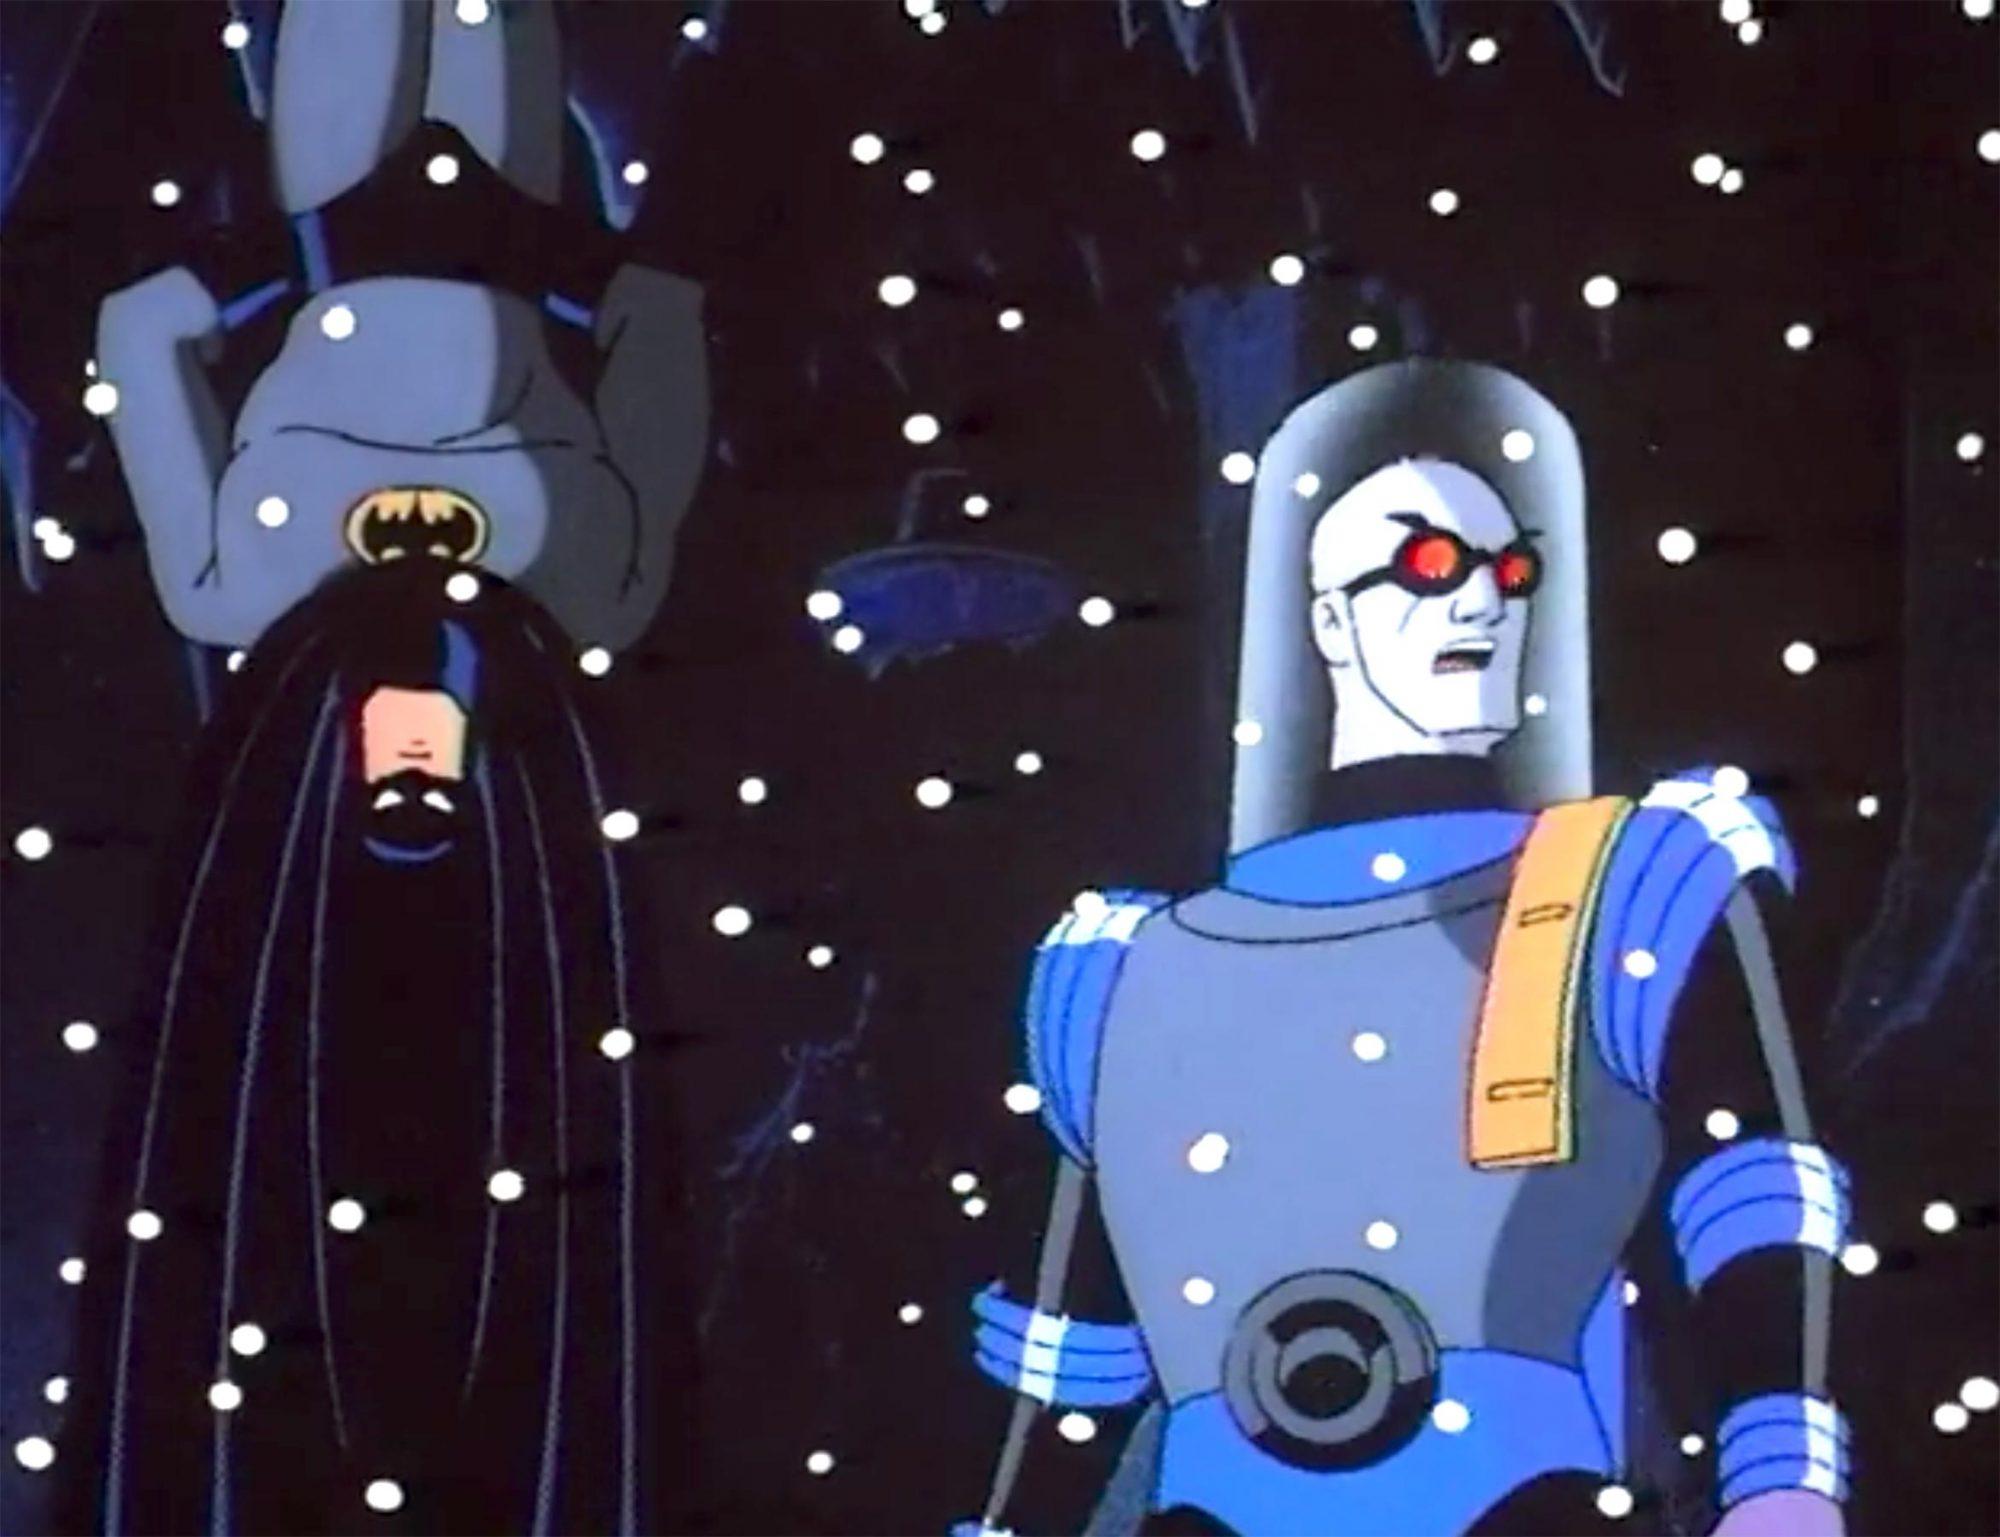 Batman The Animated Series CR: Warner Bros. Animation